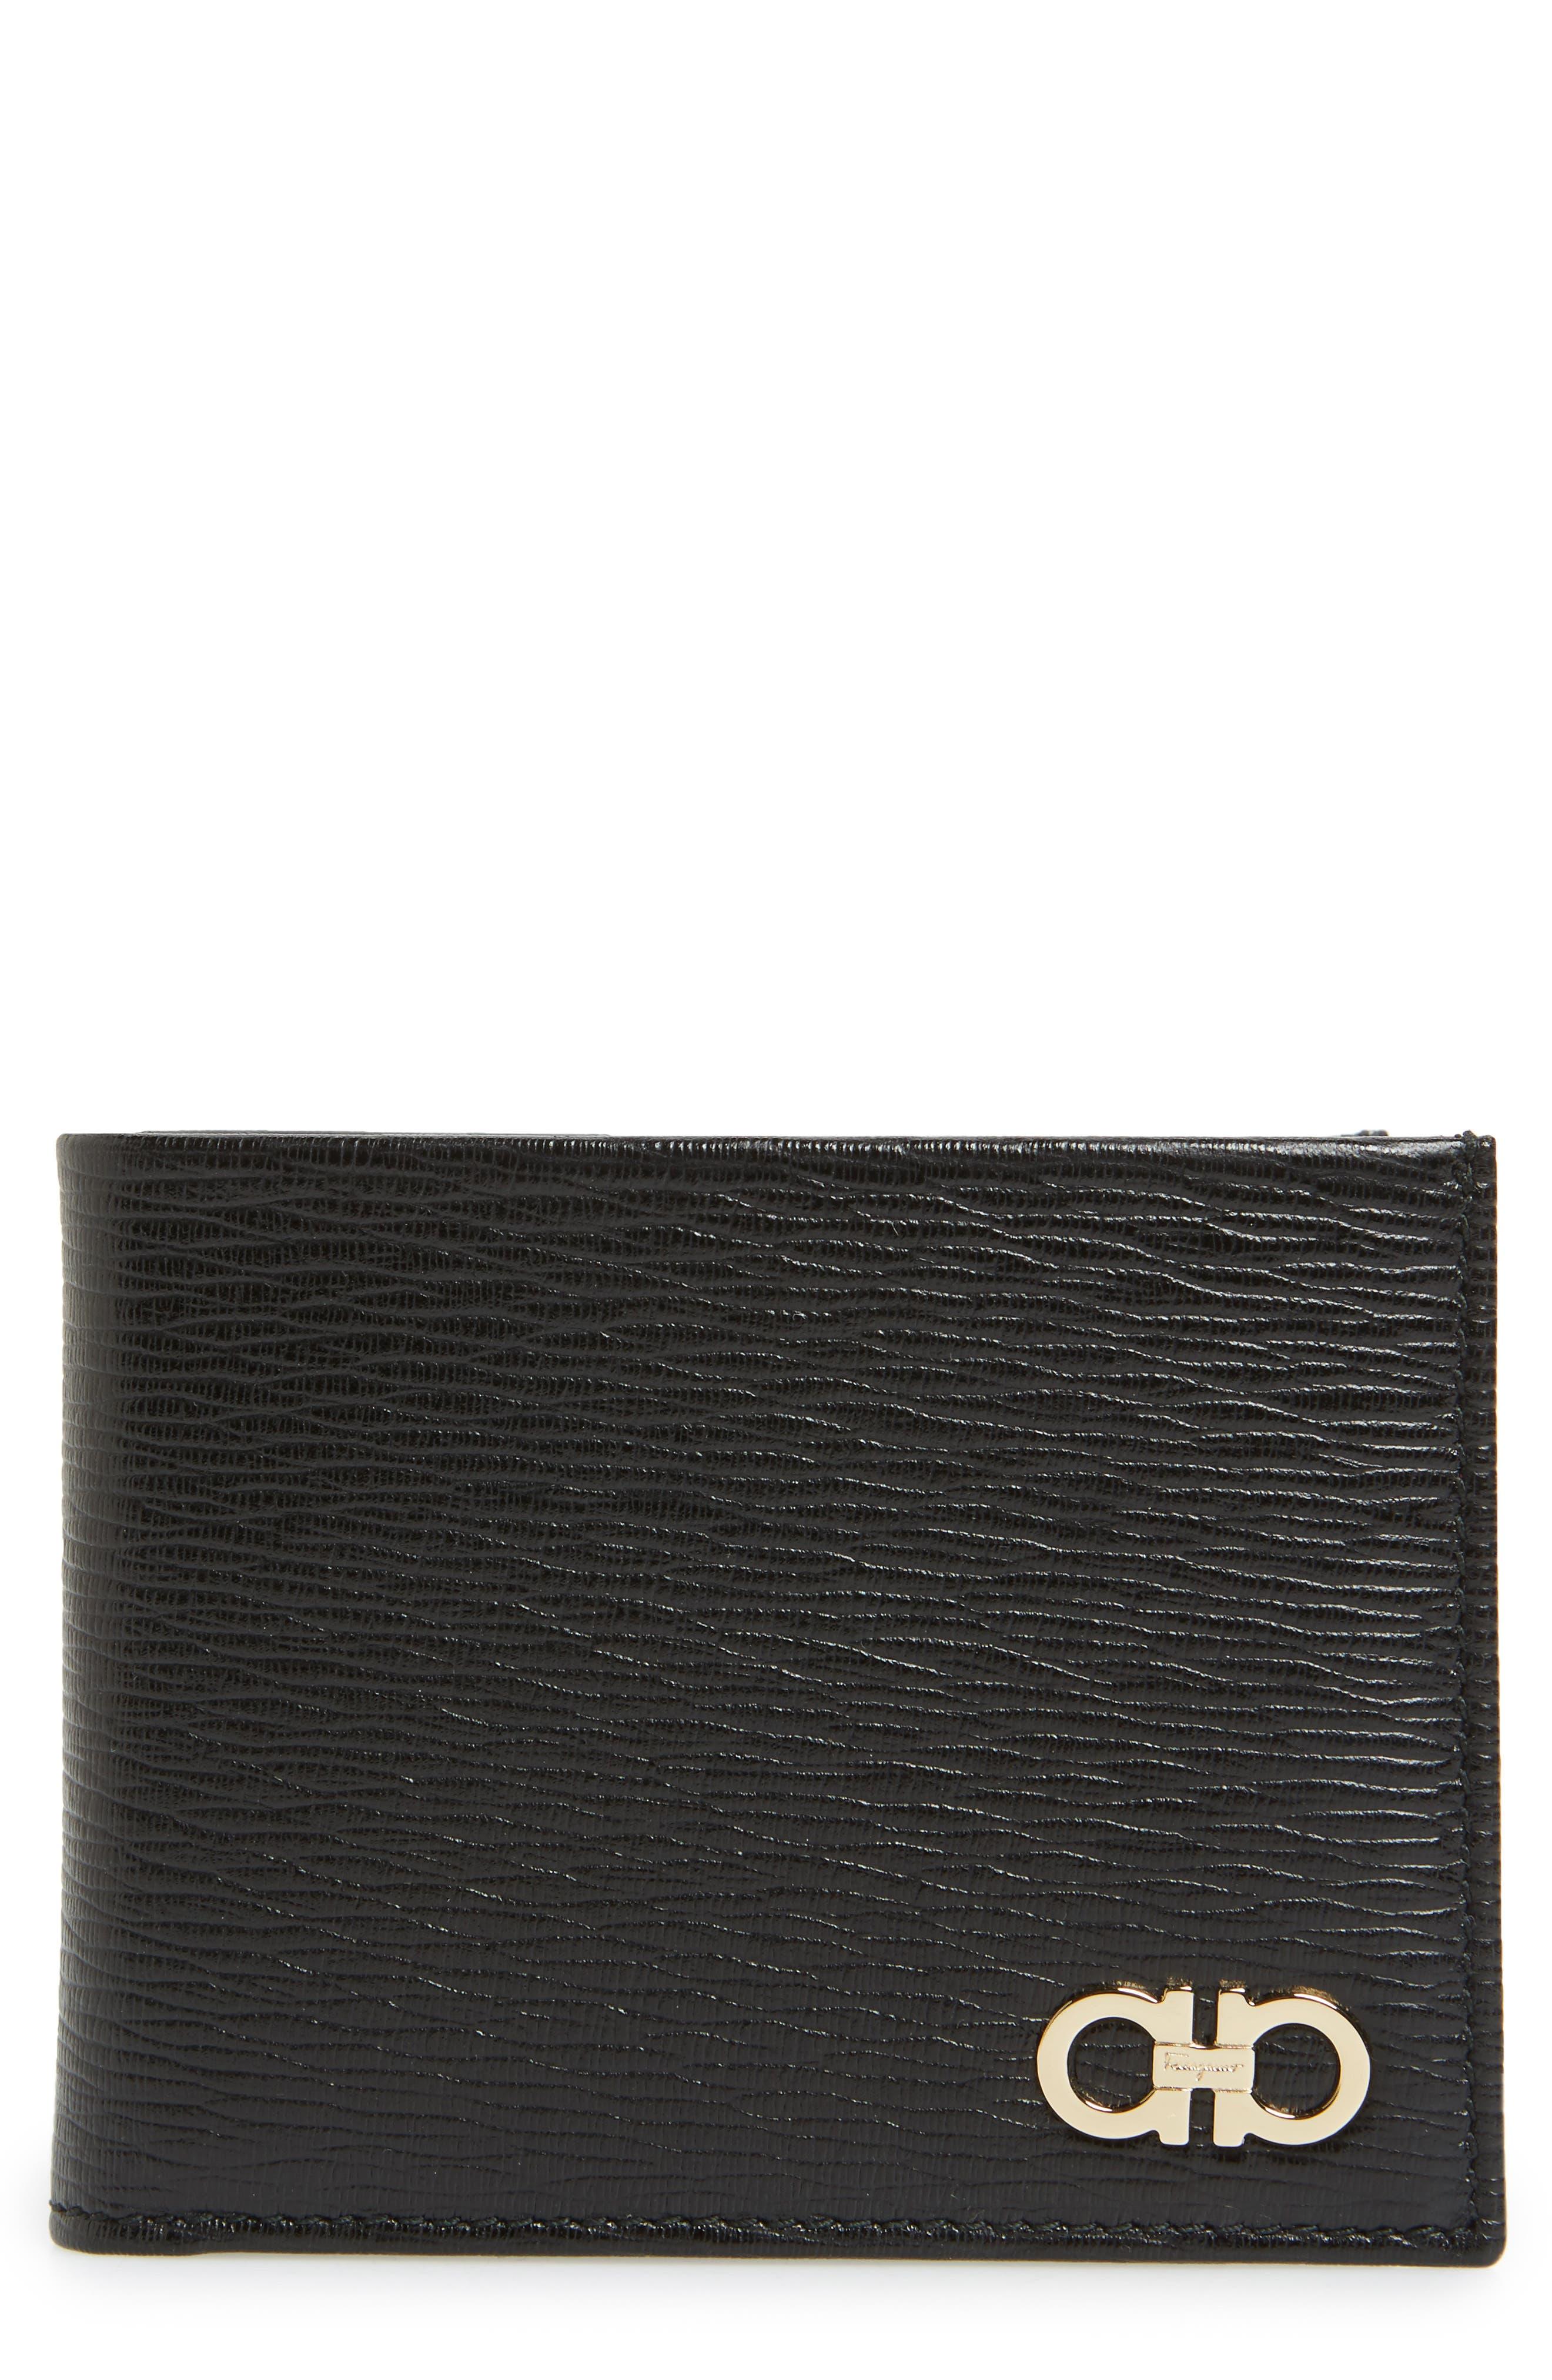 Revival Leather Wallet,                         Main,                         color, BLACK